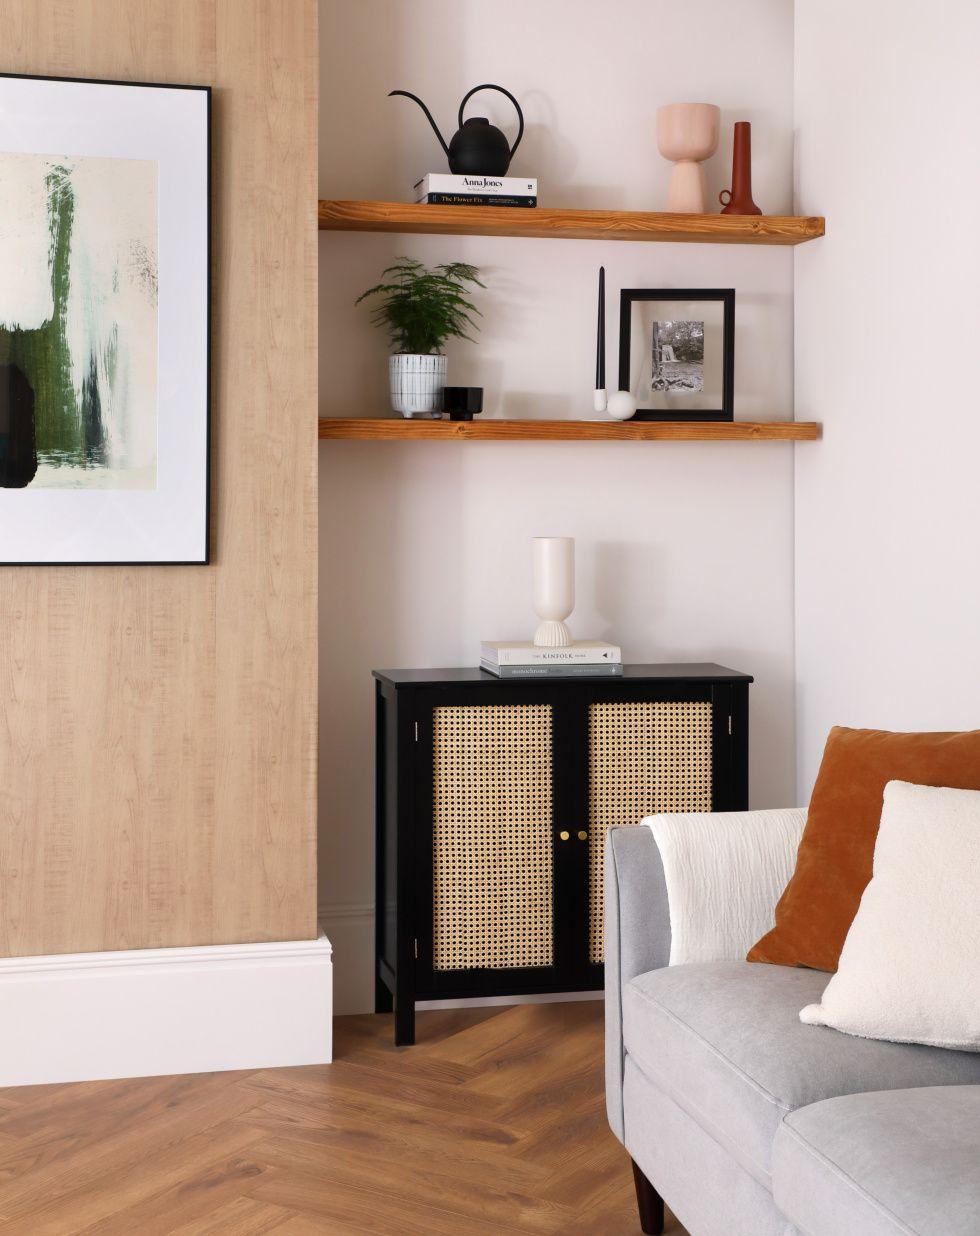 Modern living room with a Japandi style shelf